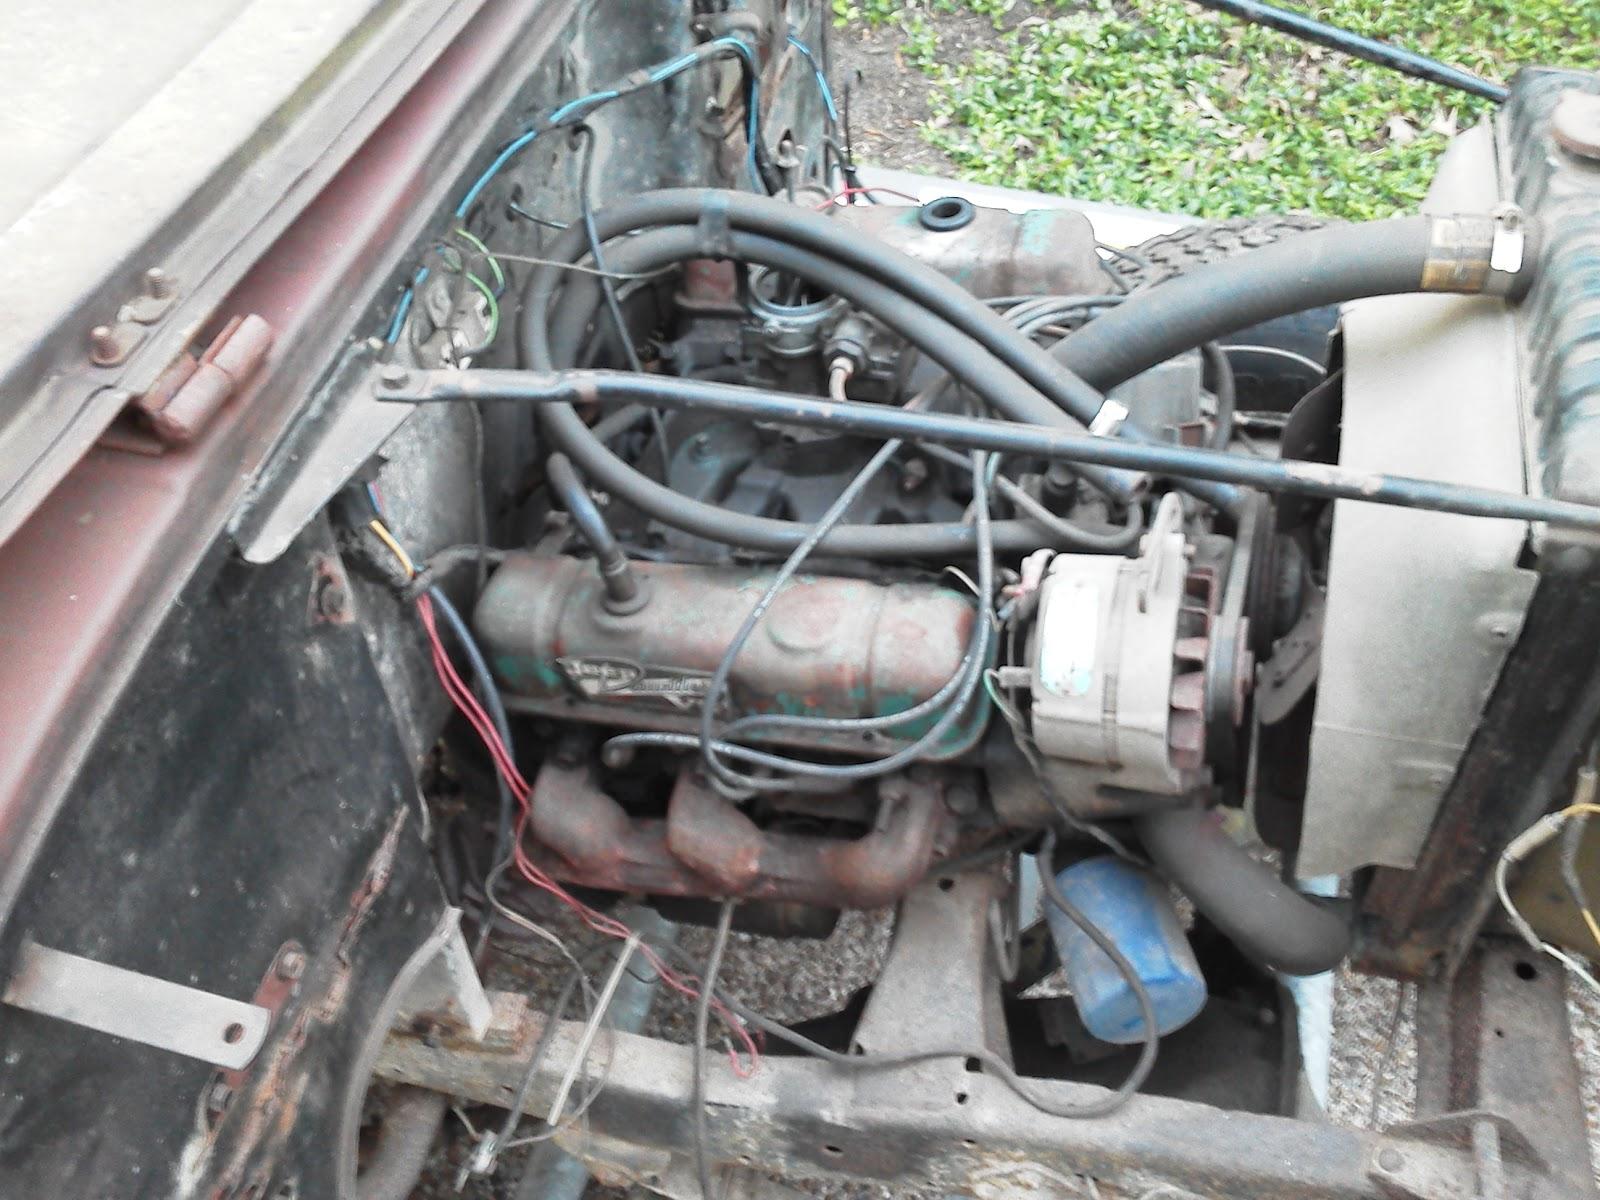 medium resolution of dauntless v6 engine diagram tractor 3 point hitch diagram 2001 pontiac 3 8 engine diagram 3 8